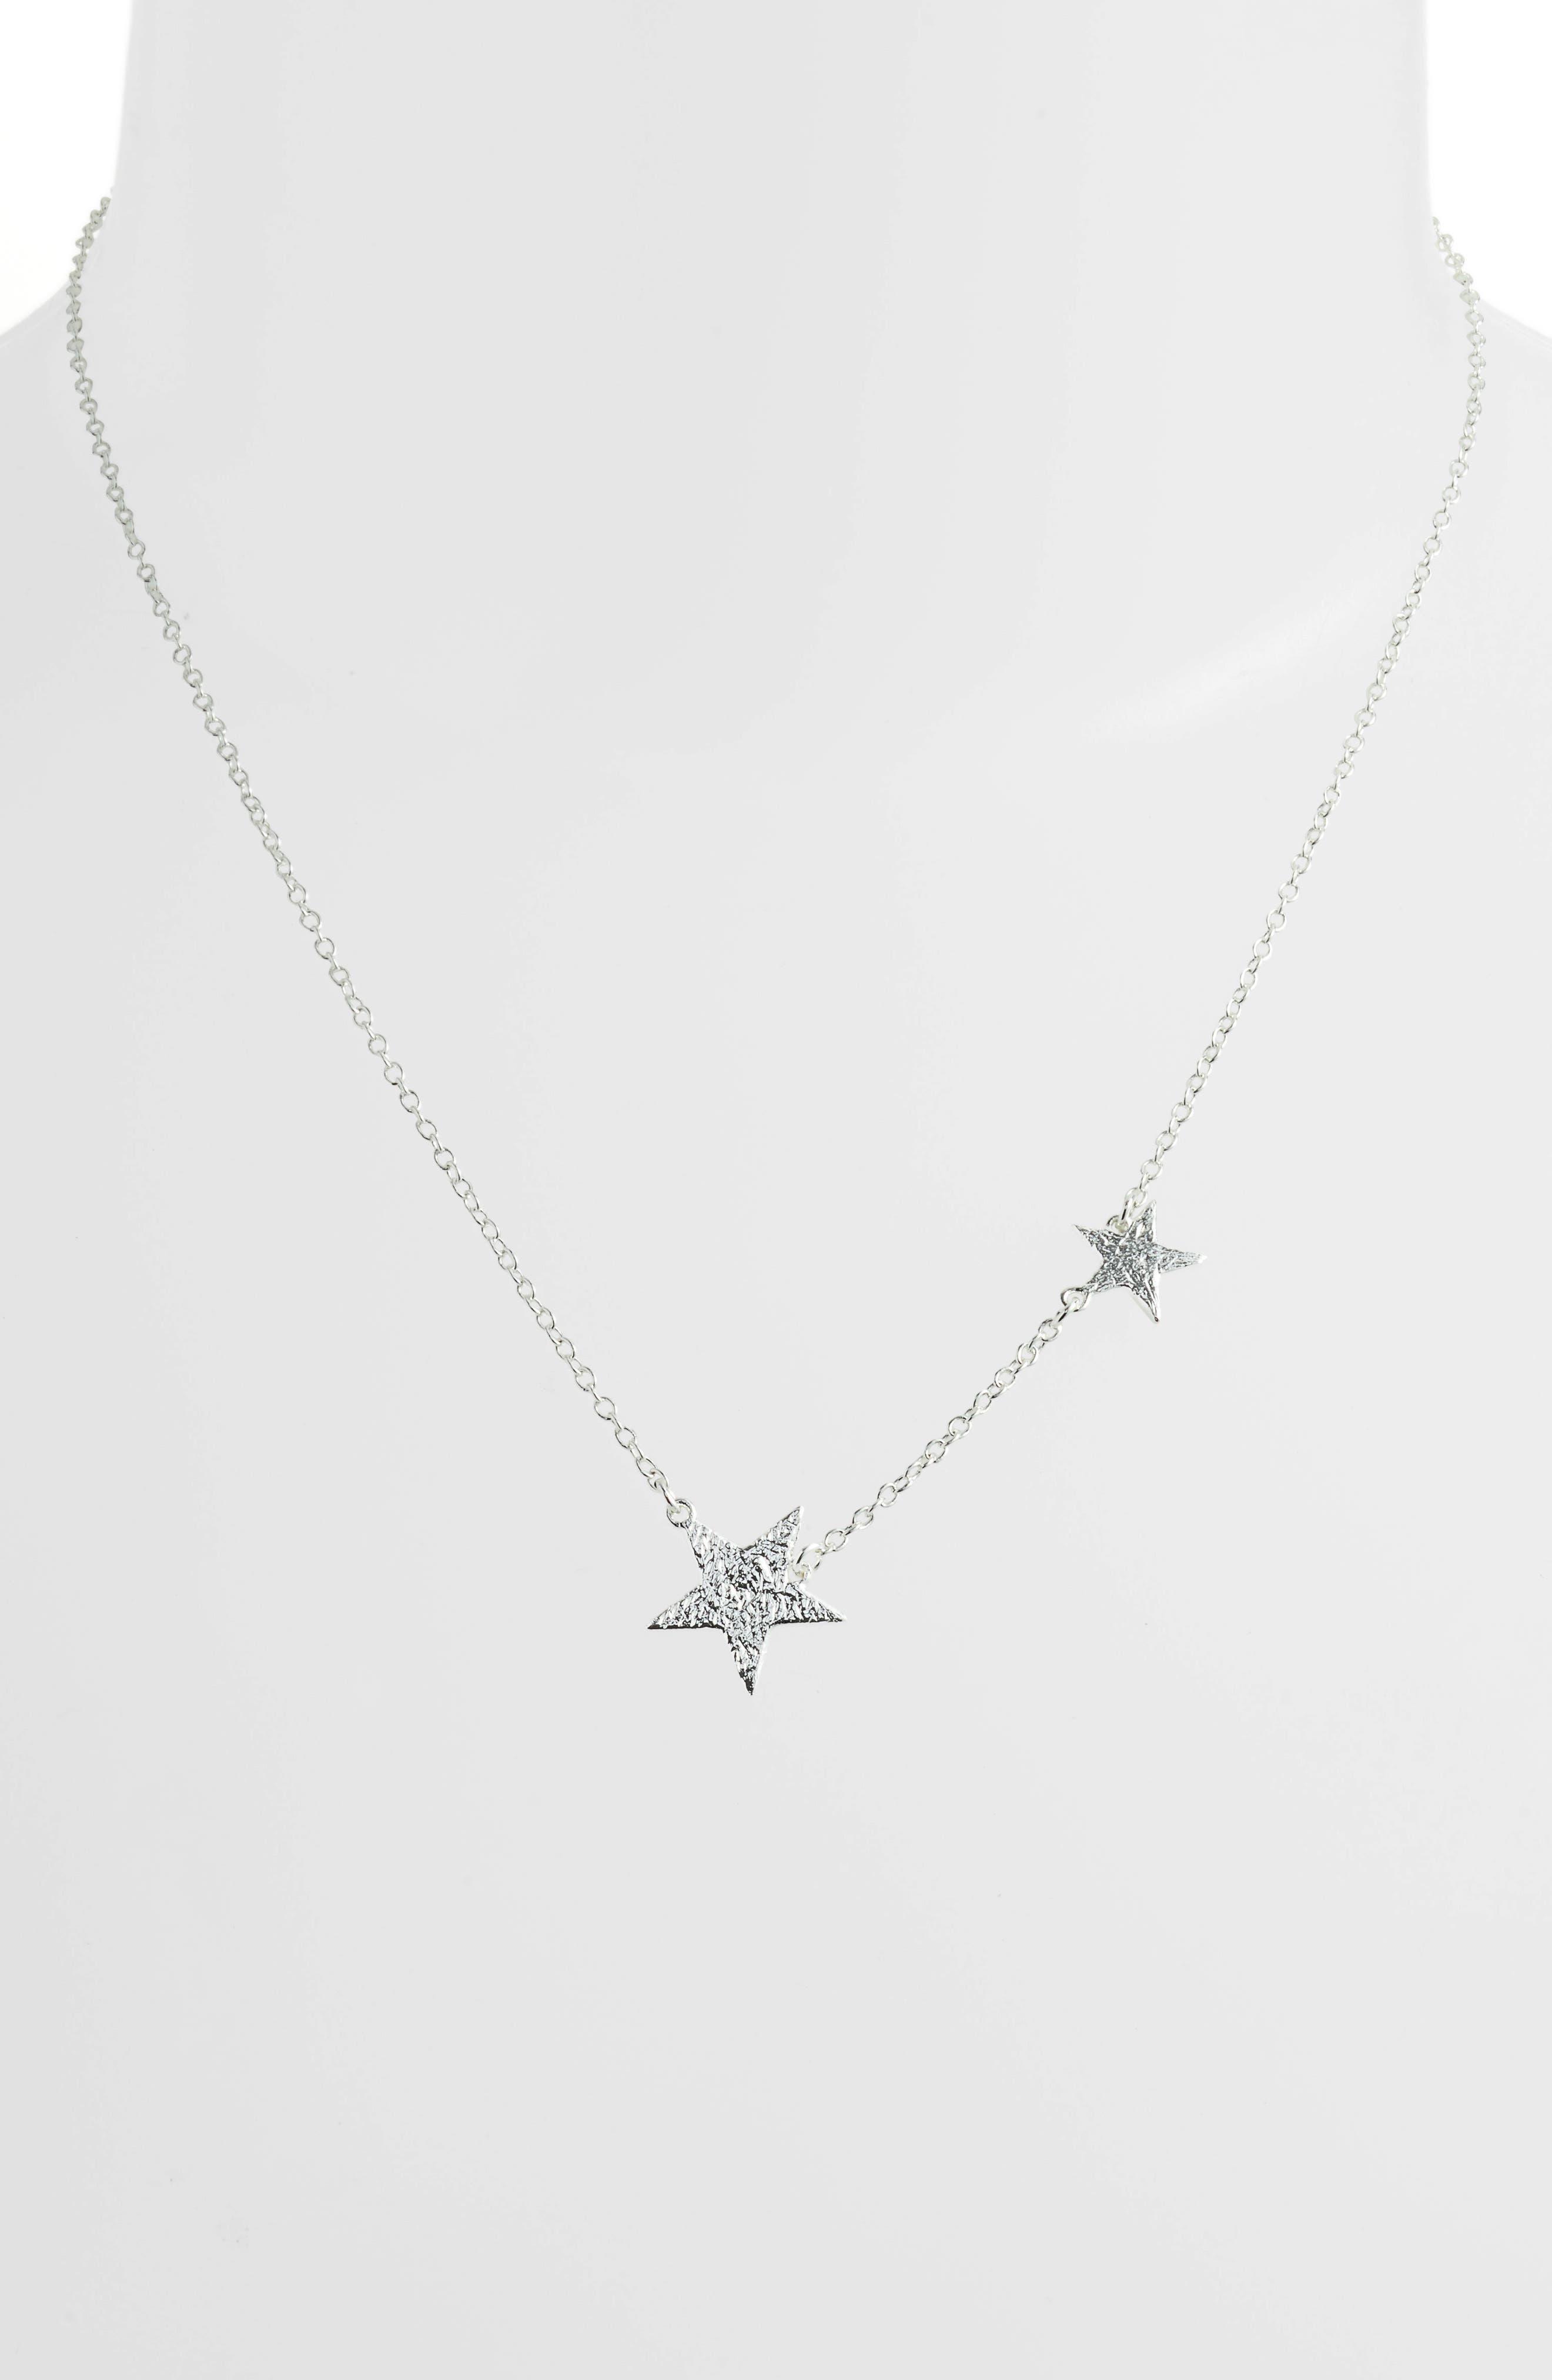 Star Pendant Necklace,                             Alternate thumbnail 2, color,                             SILVER